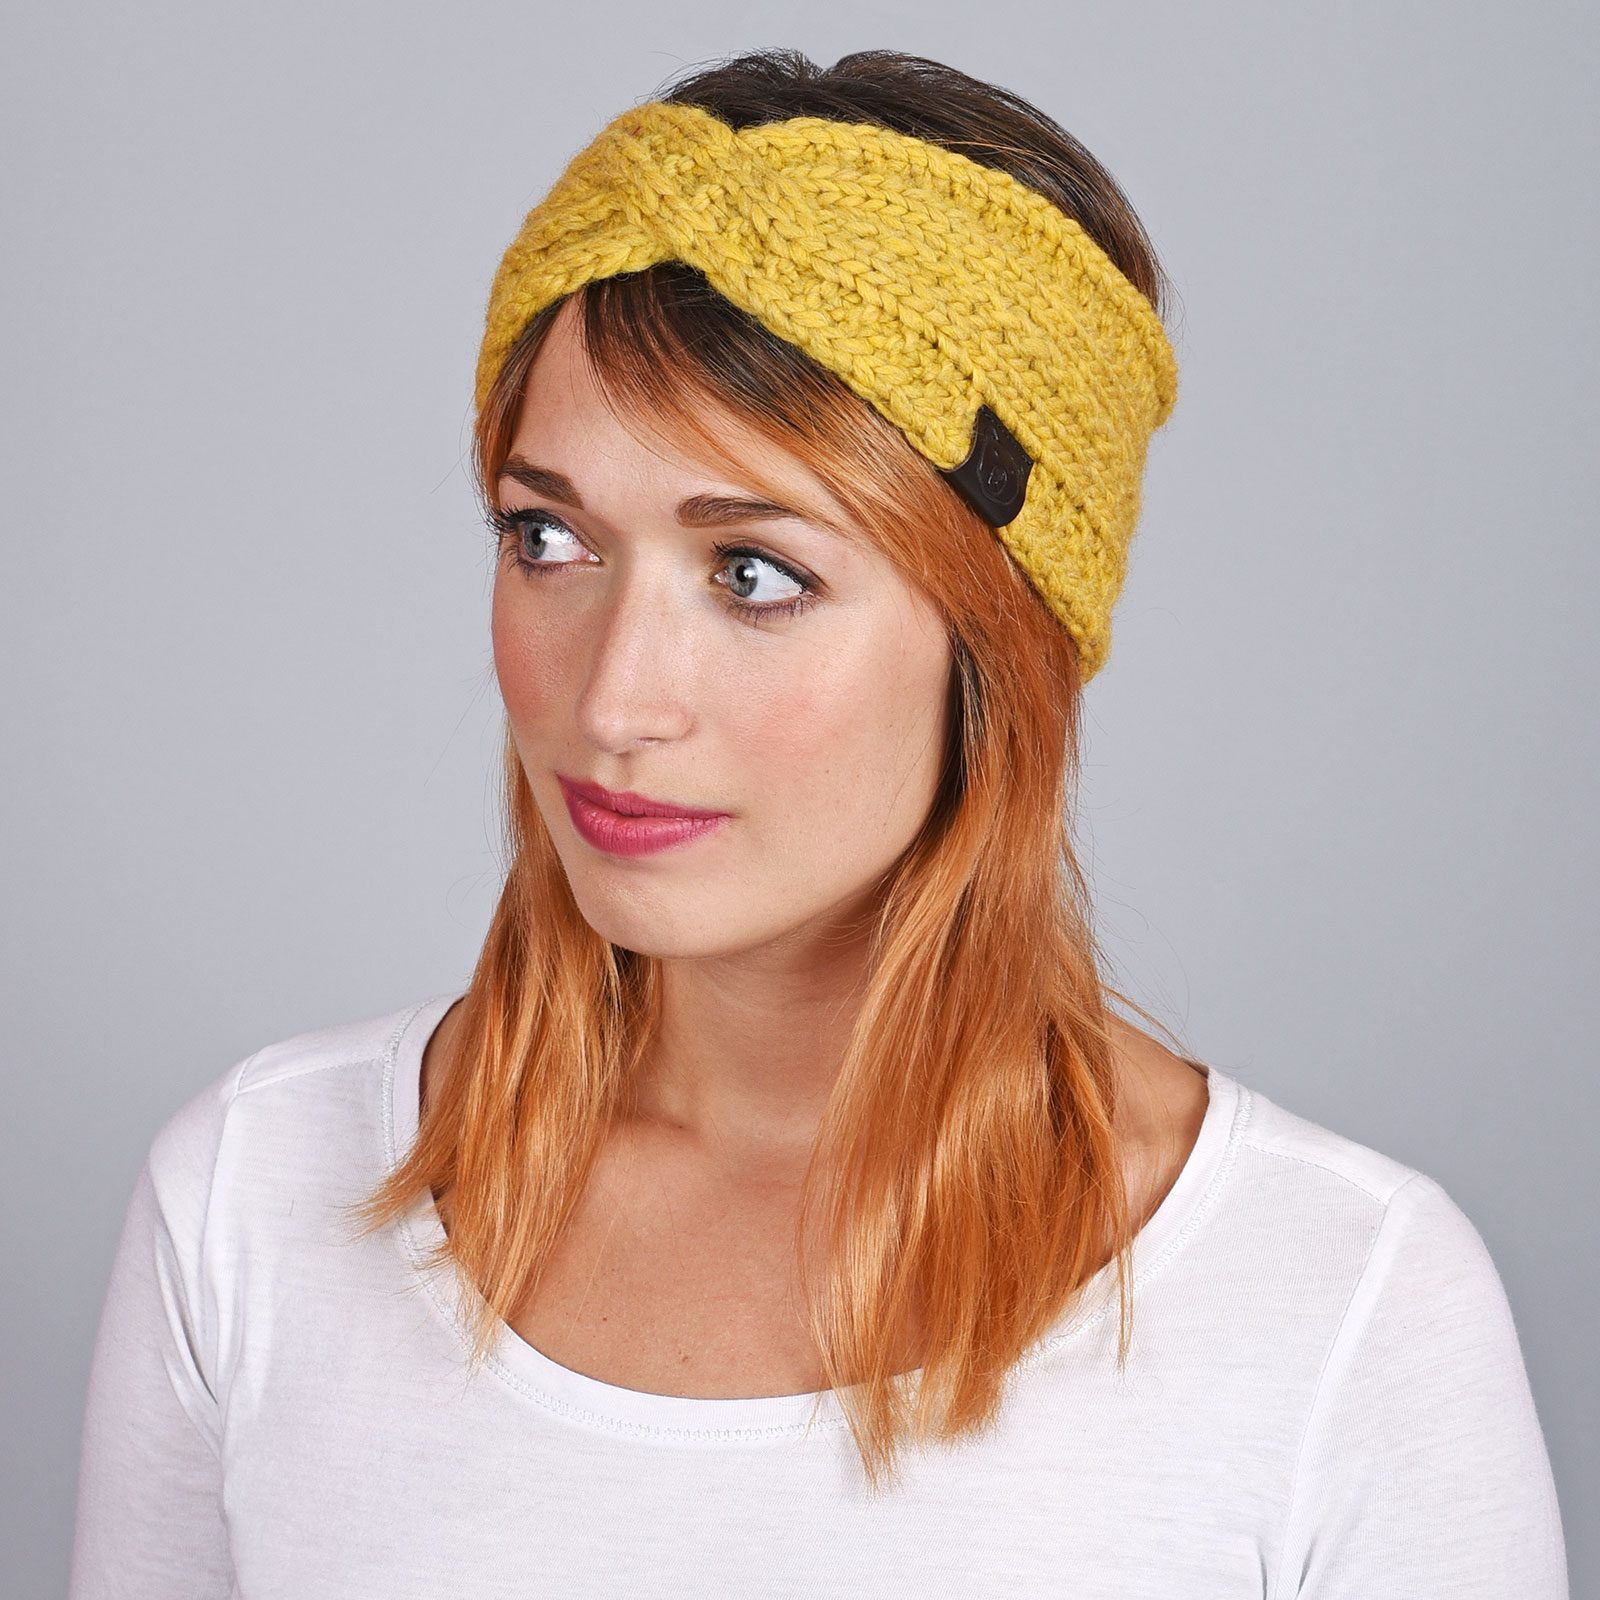 http://lookbook.allee-du-foulard.fr/wp-content/uploads/2018/12/CP-01077-VF16-1-bandeau-femme-jaune-moutarde-tendance-1600x1600.jpg